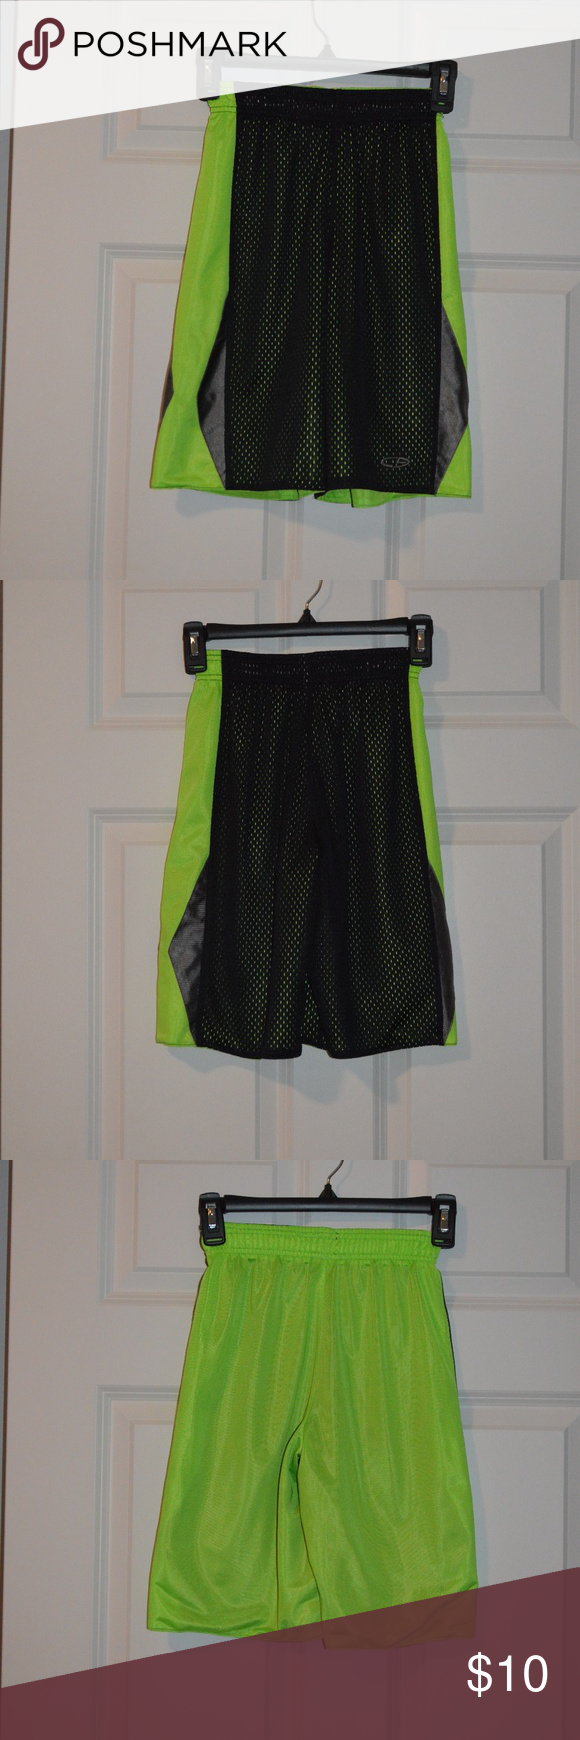 bd138a046b4f Boys Size Medium Reversible Athletic Shorts Boys Size Medium C9 Champion  Reversible Mesh Black Neon Green Athletic Shorts. No pockets.